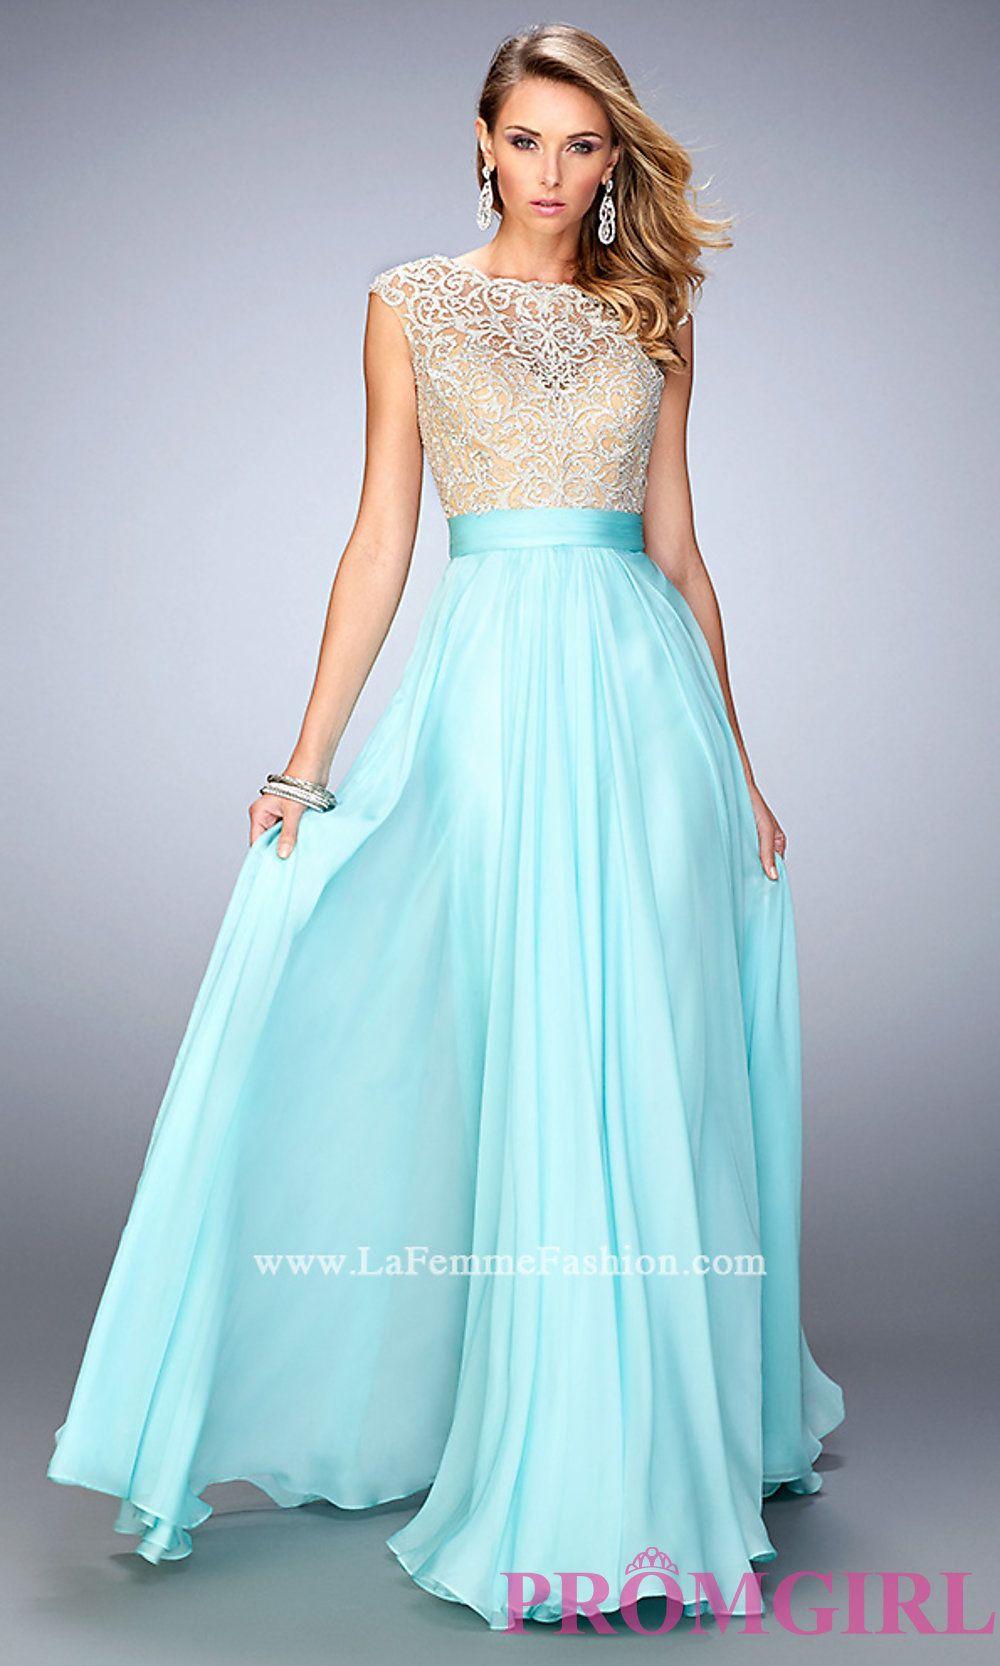 La Femme Prom Dress with Illusion Back Style: LF-21486 | TL ...